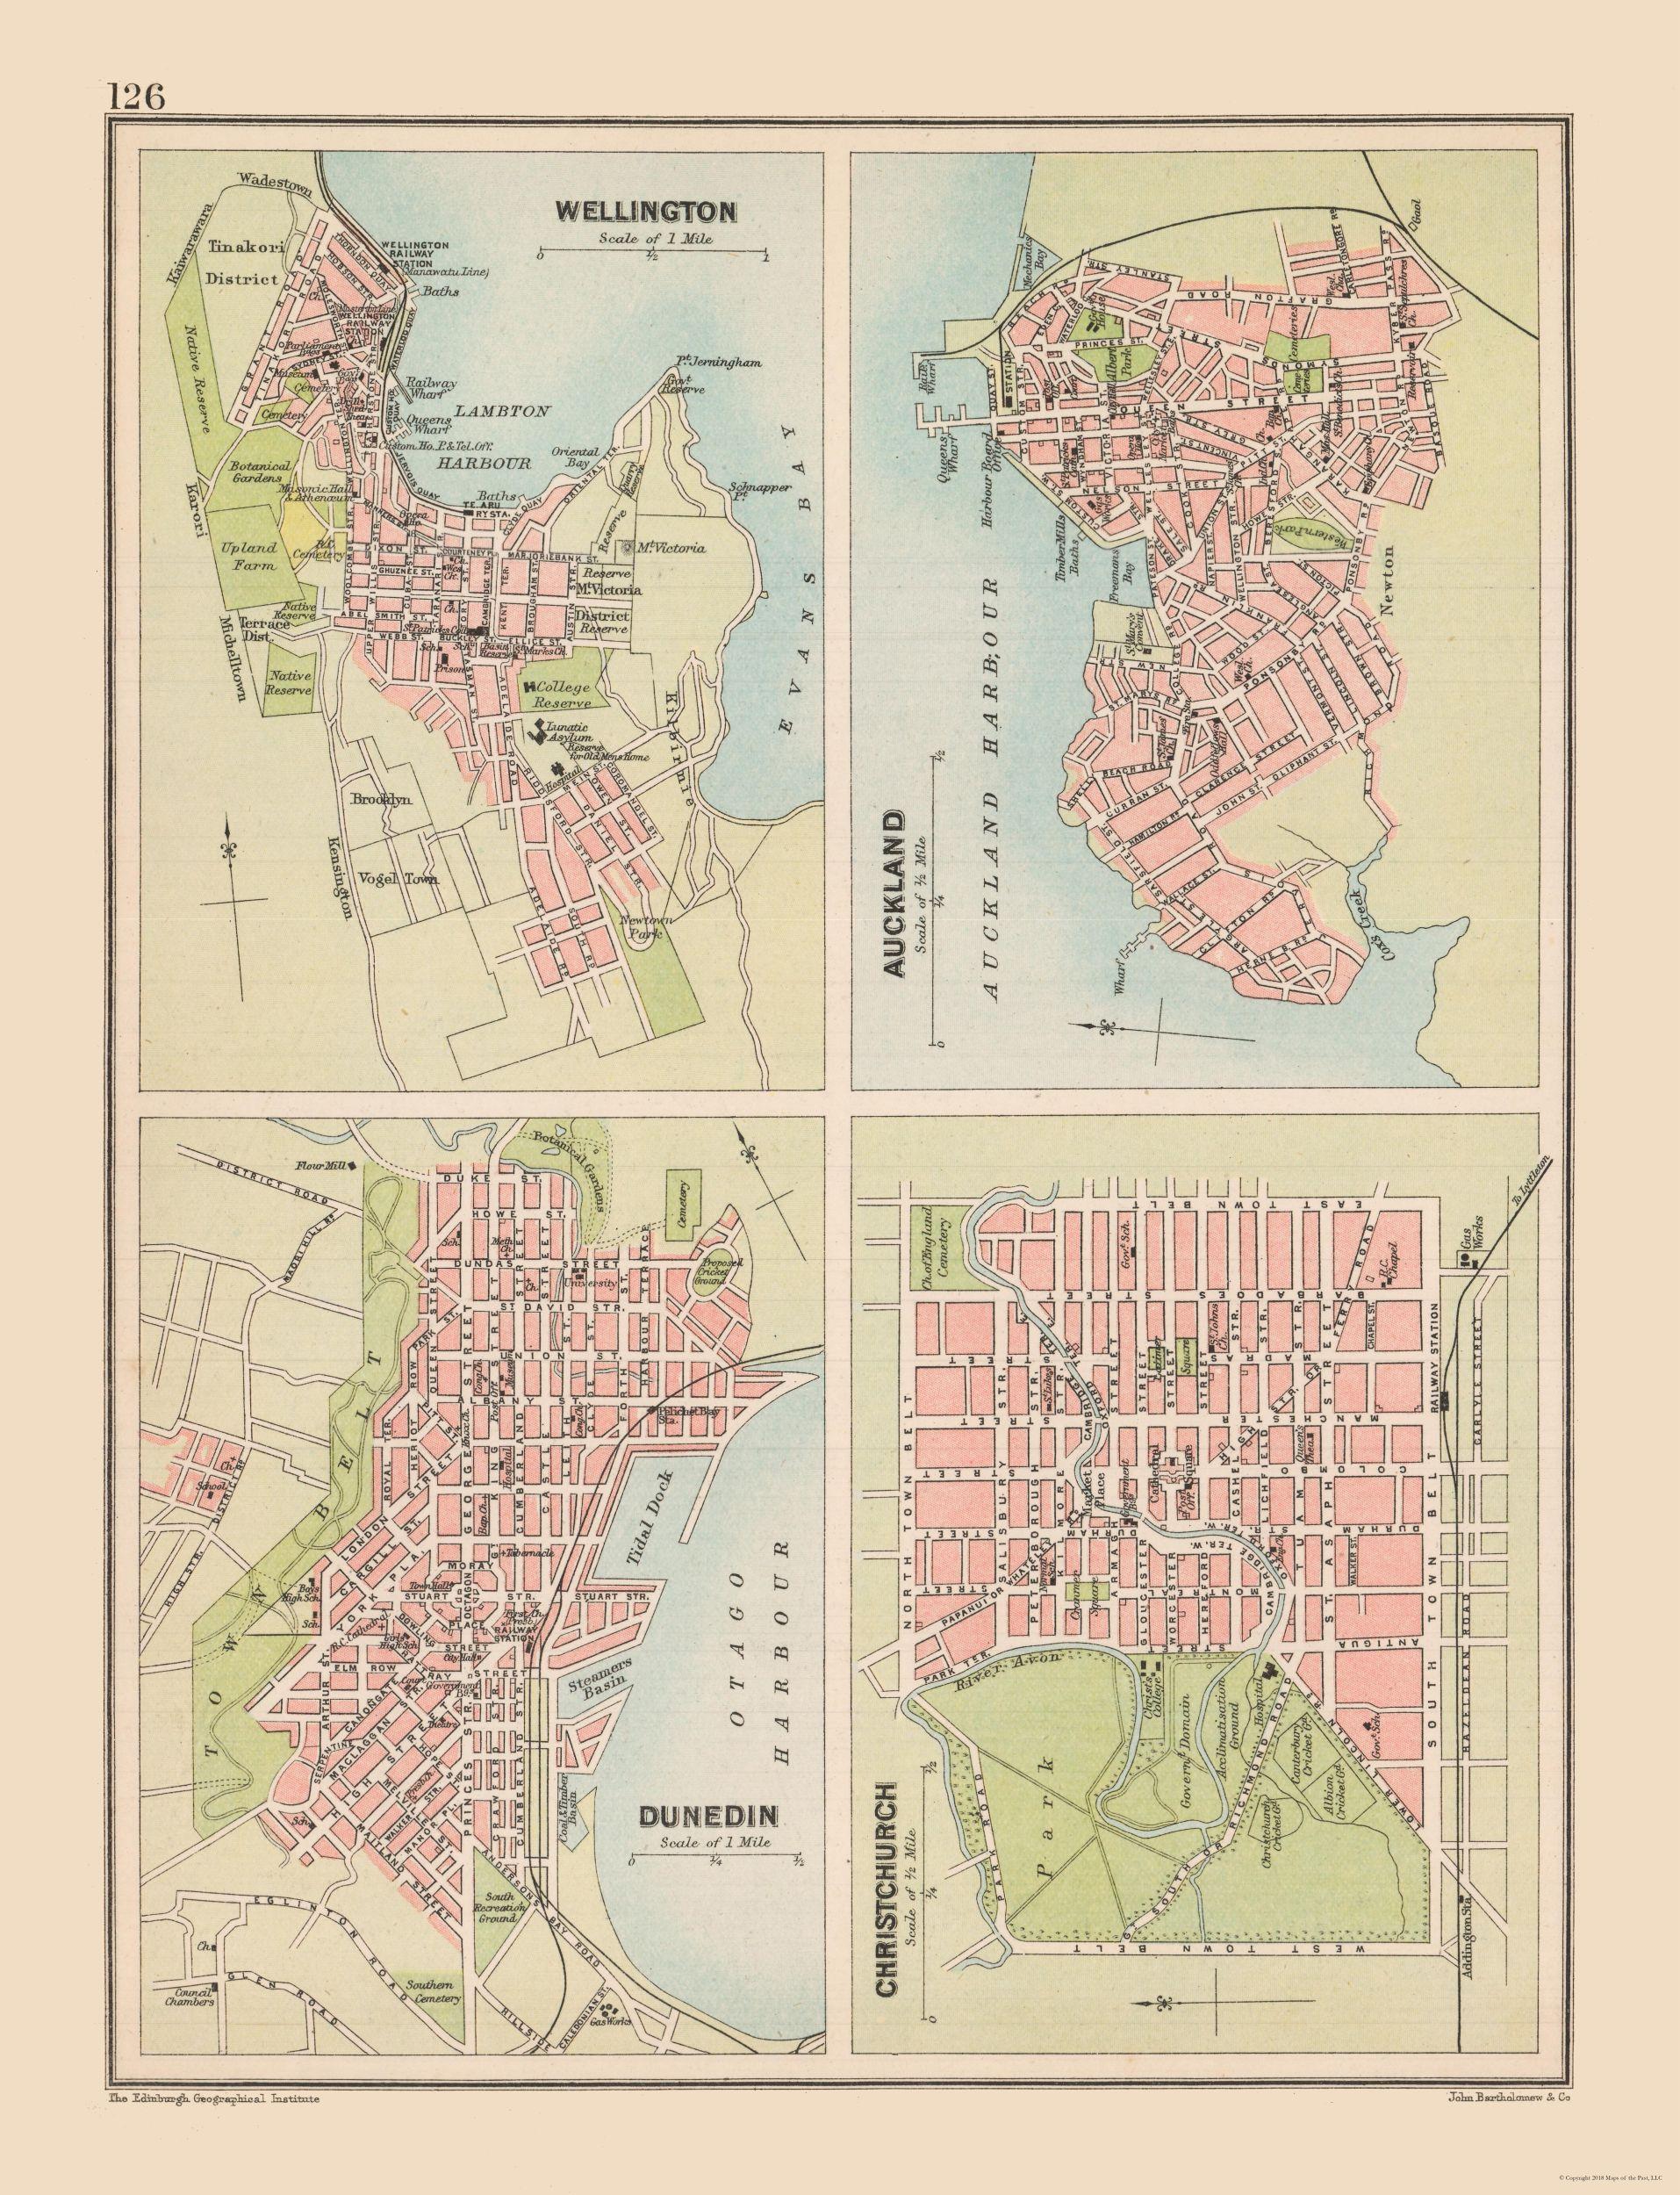 Map Of New Zealand With Cities.International Map New Zealand Major Cities Bartholomew 1892 23 X 30 04